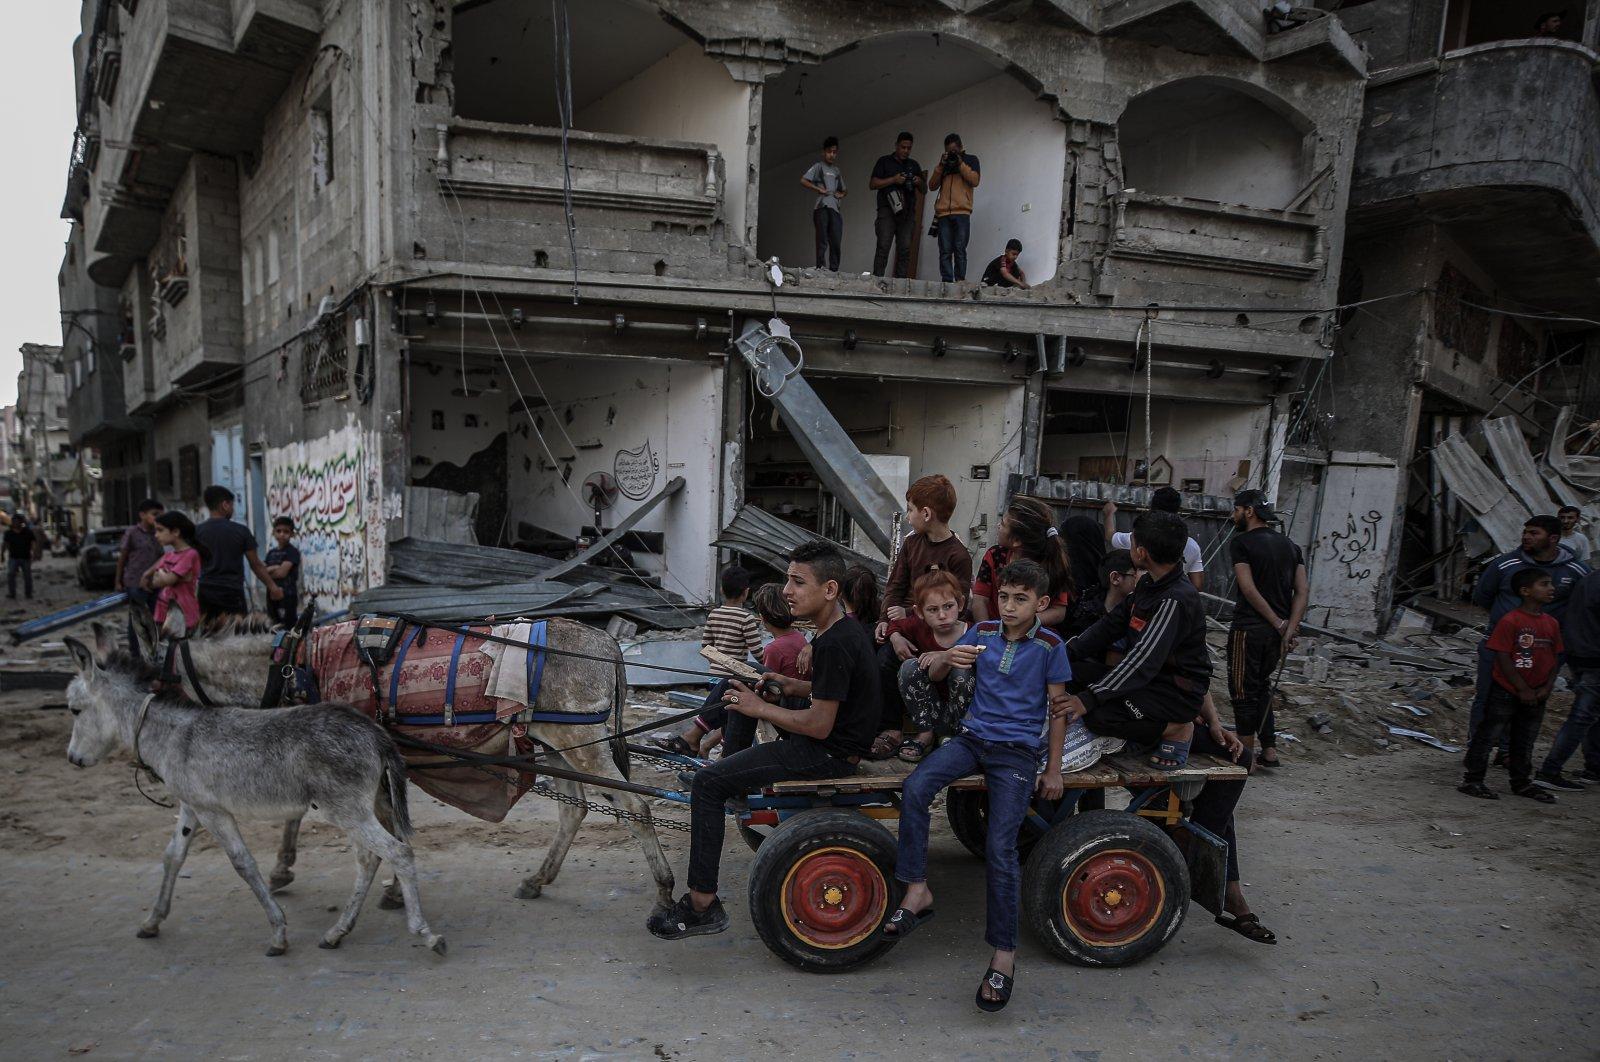 Palestinian civilians fleeing their hometown amid Israeli bombardments in the Gaza Strip, Palestine, May 21, 2021. (AA Photo)